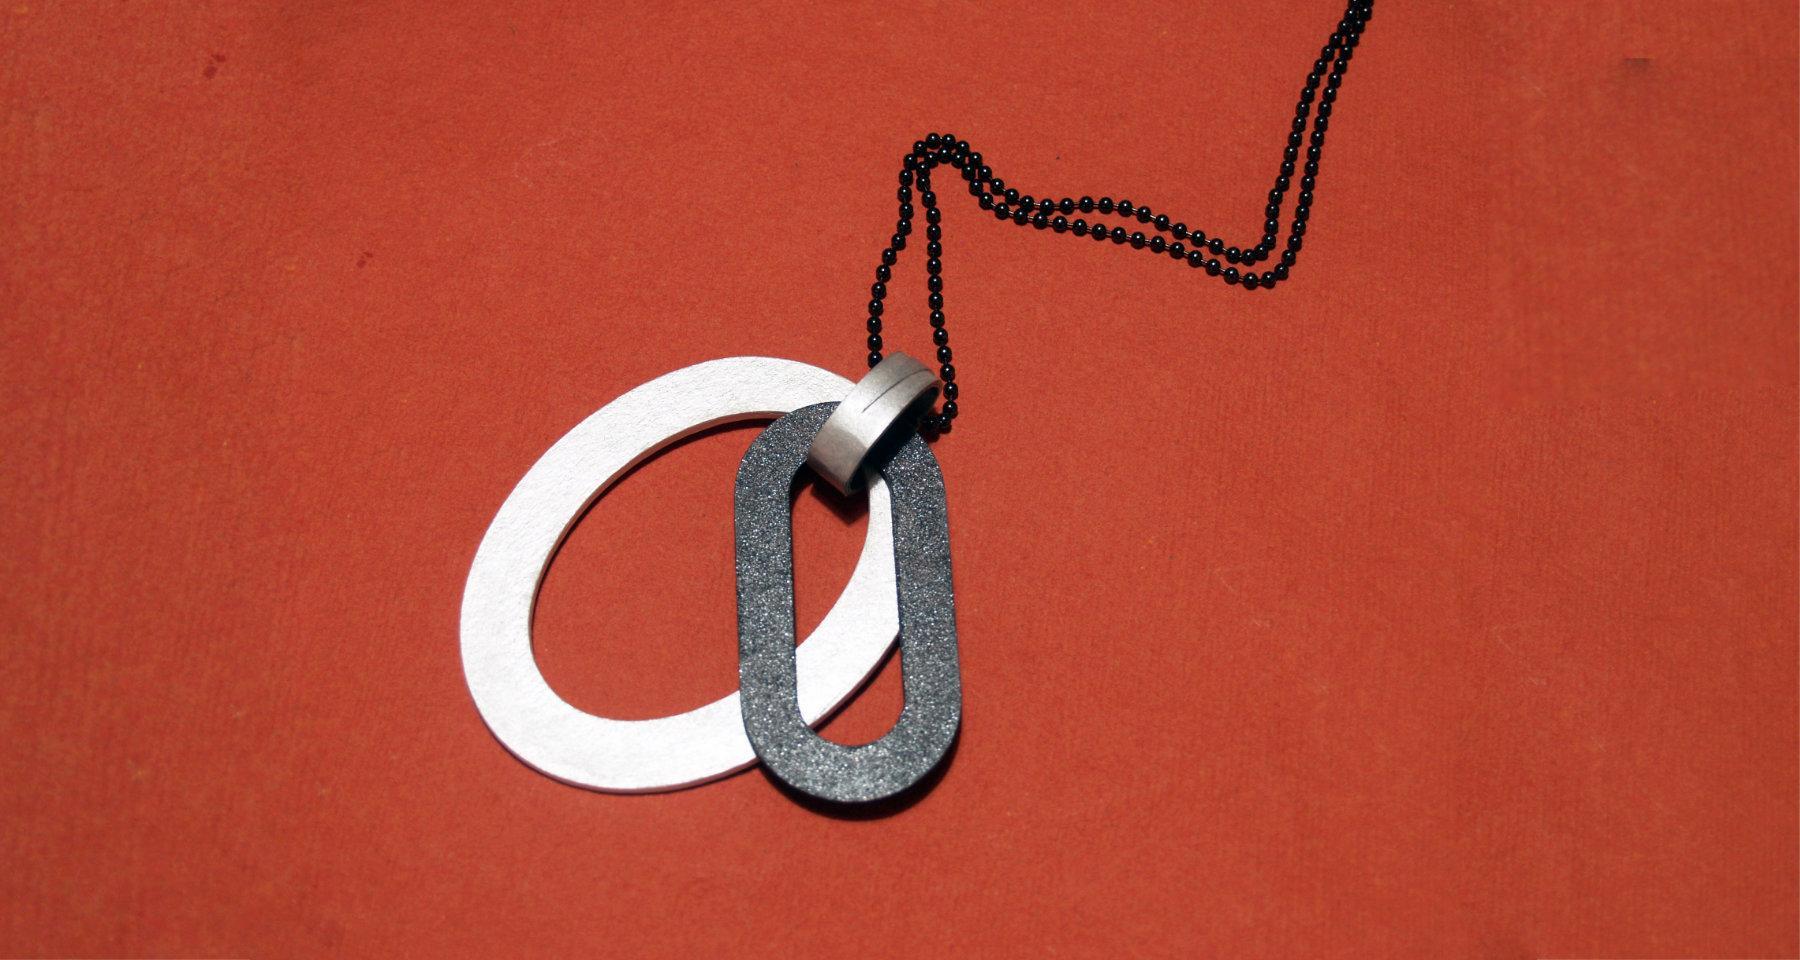 fd71d0aad1 Paperonu - Πρωτότυπα κοσμήματα από...χαρτί